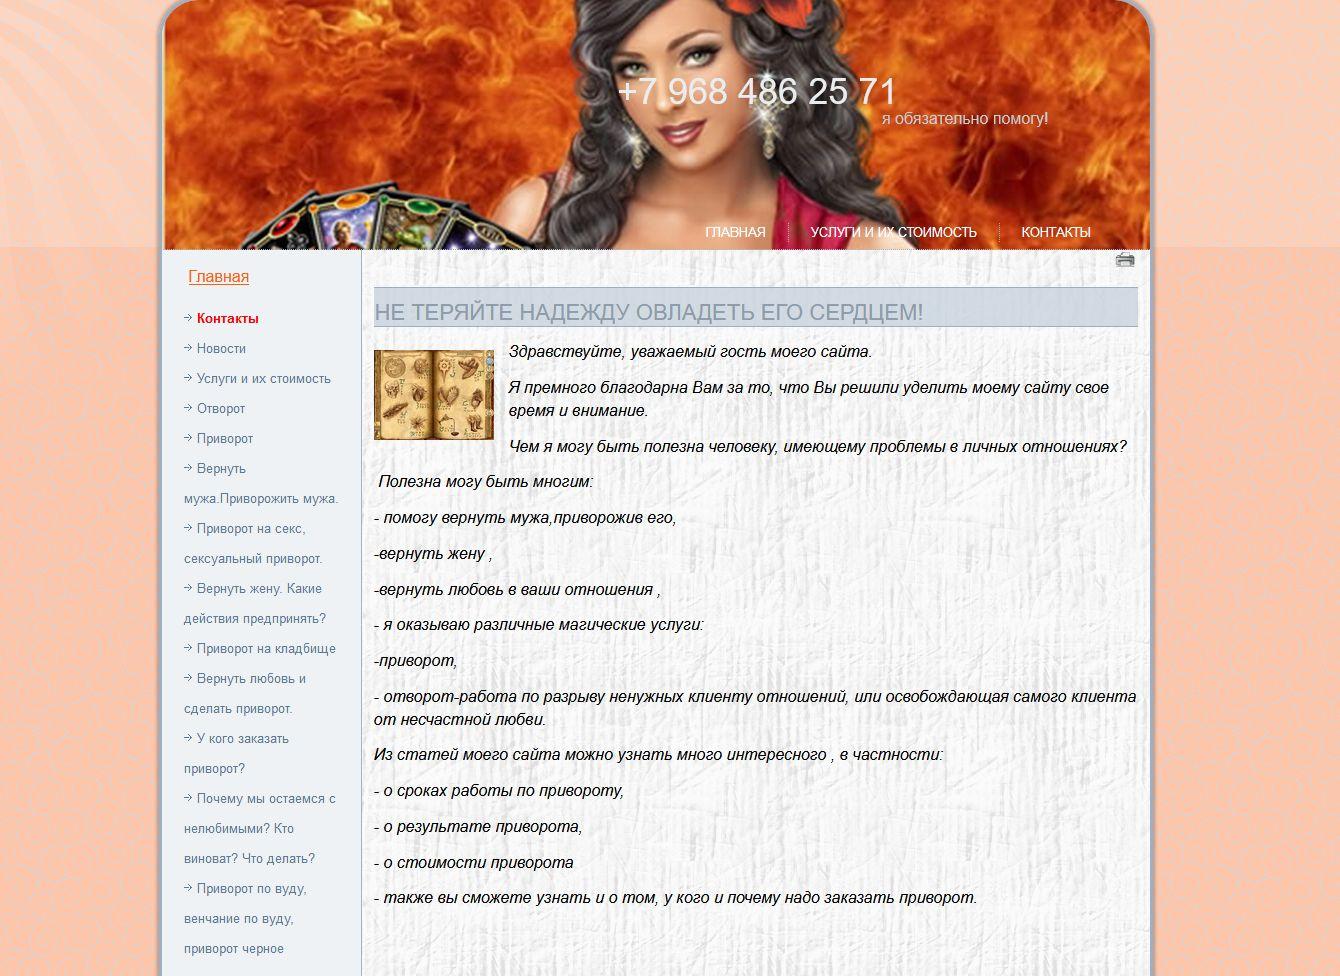 Магические услуги на arsmagic.ru отзывы